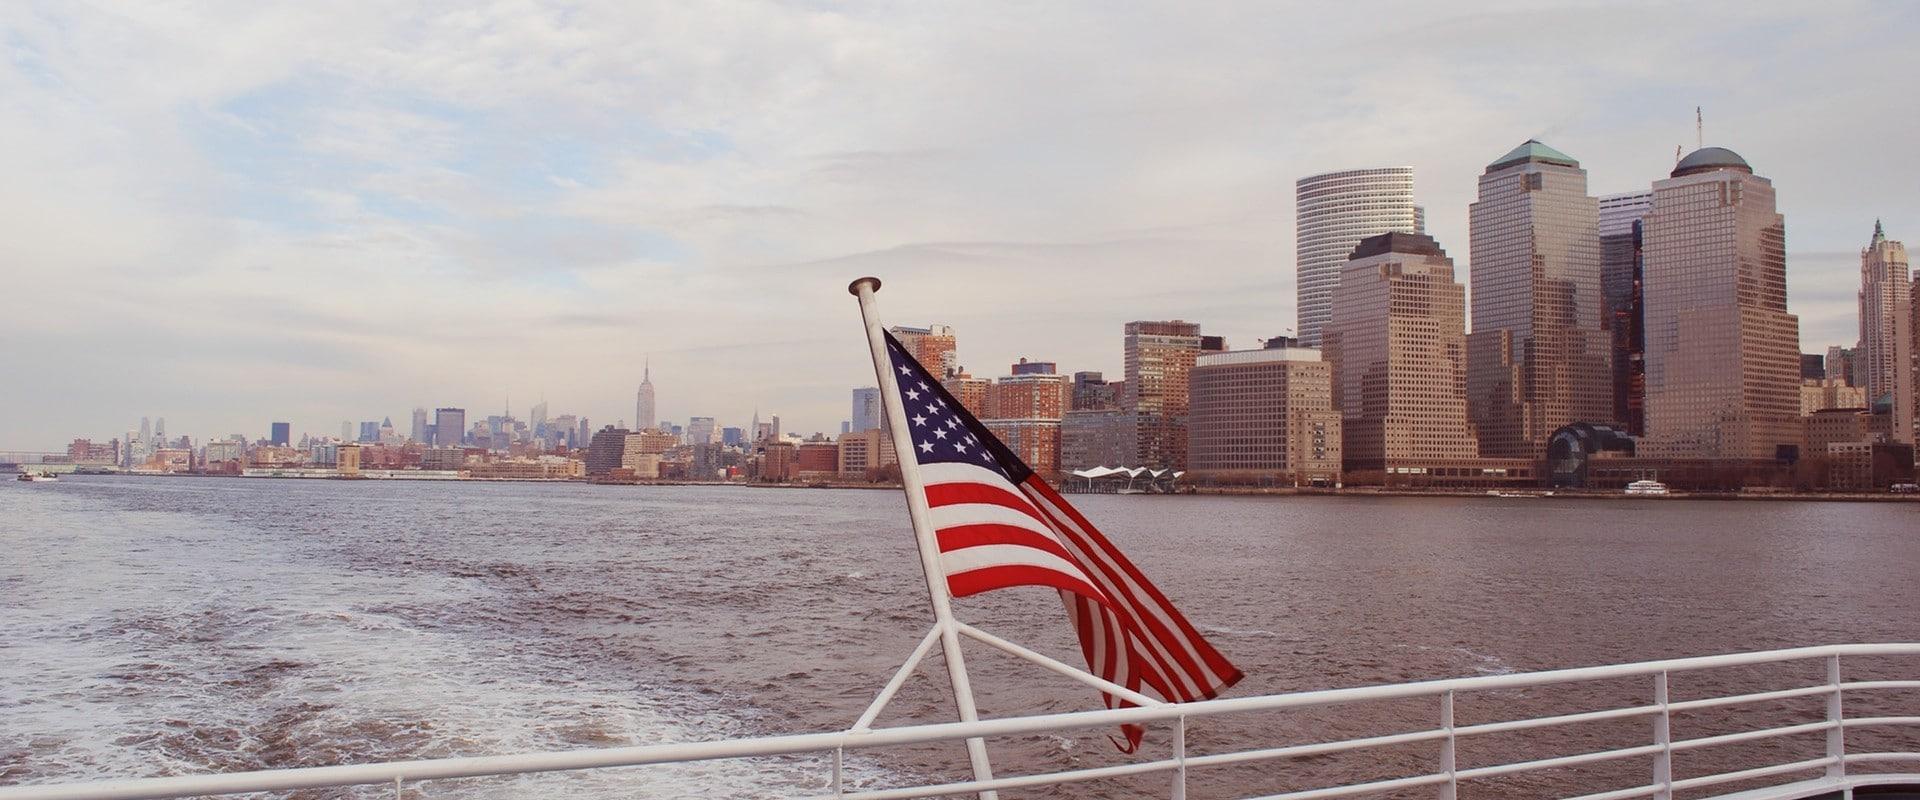 us flag on boat